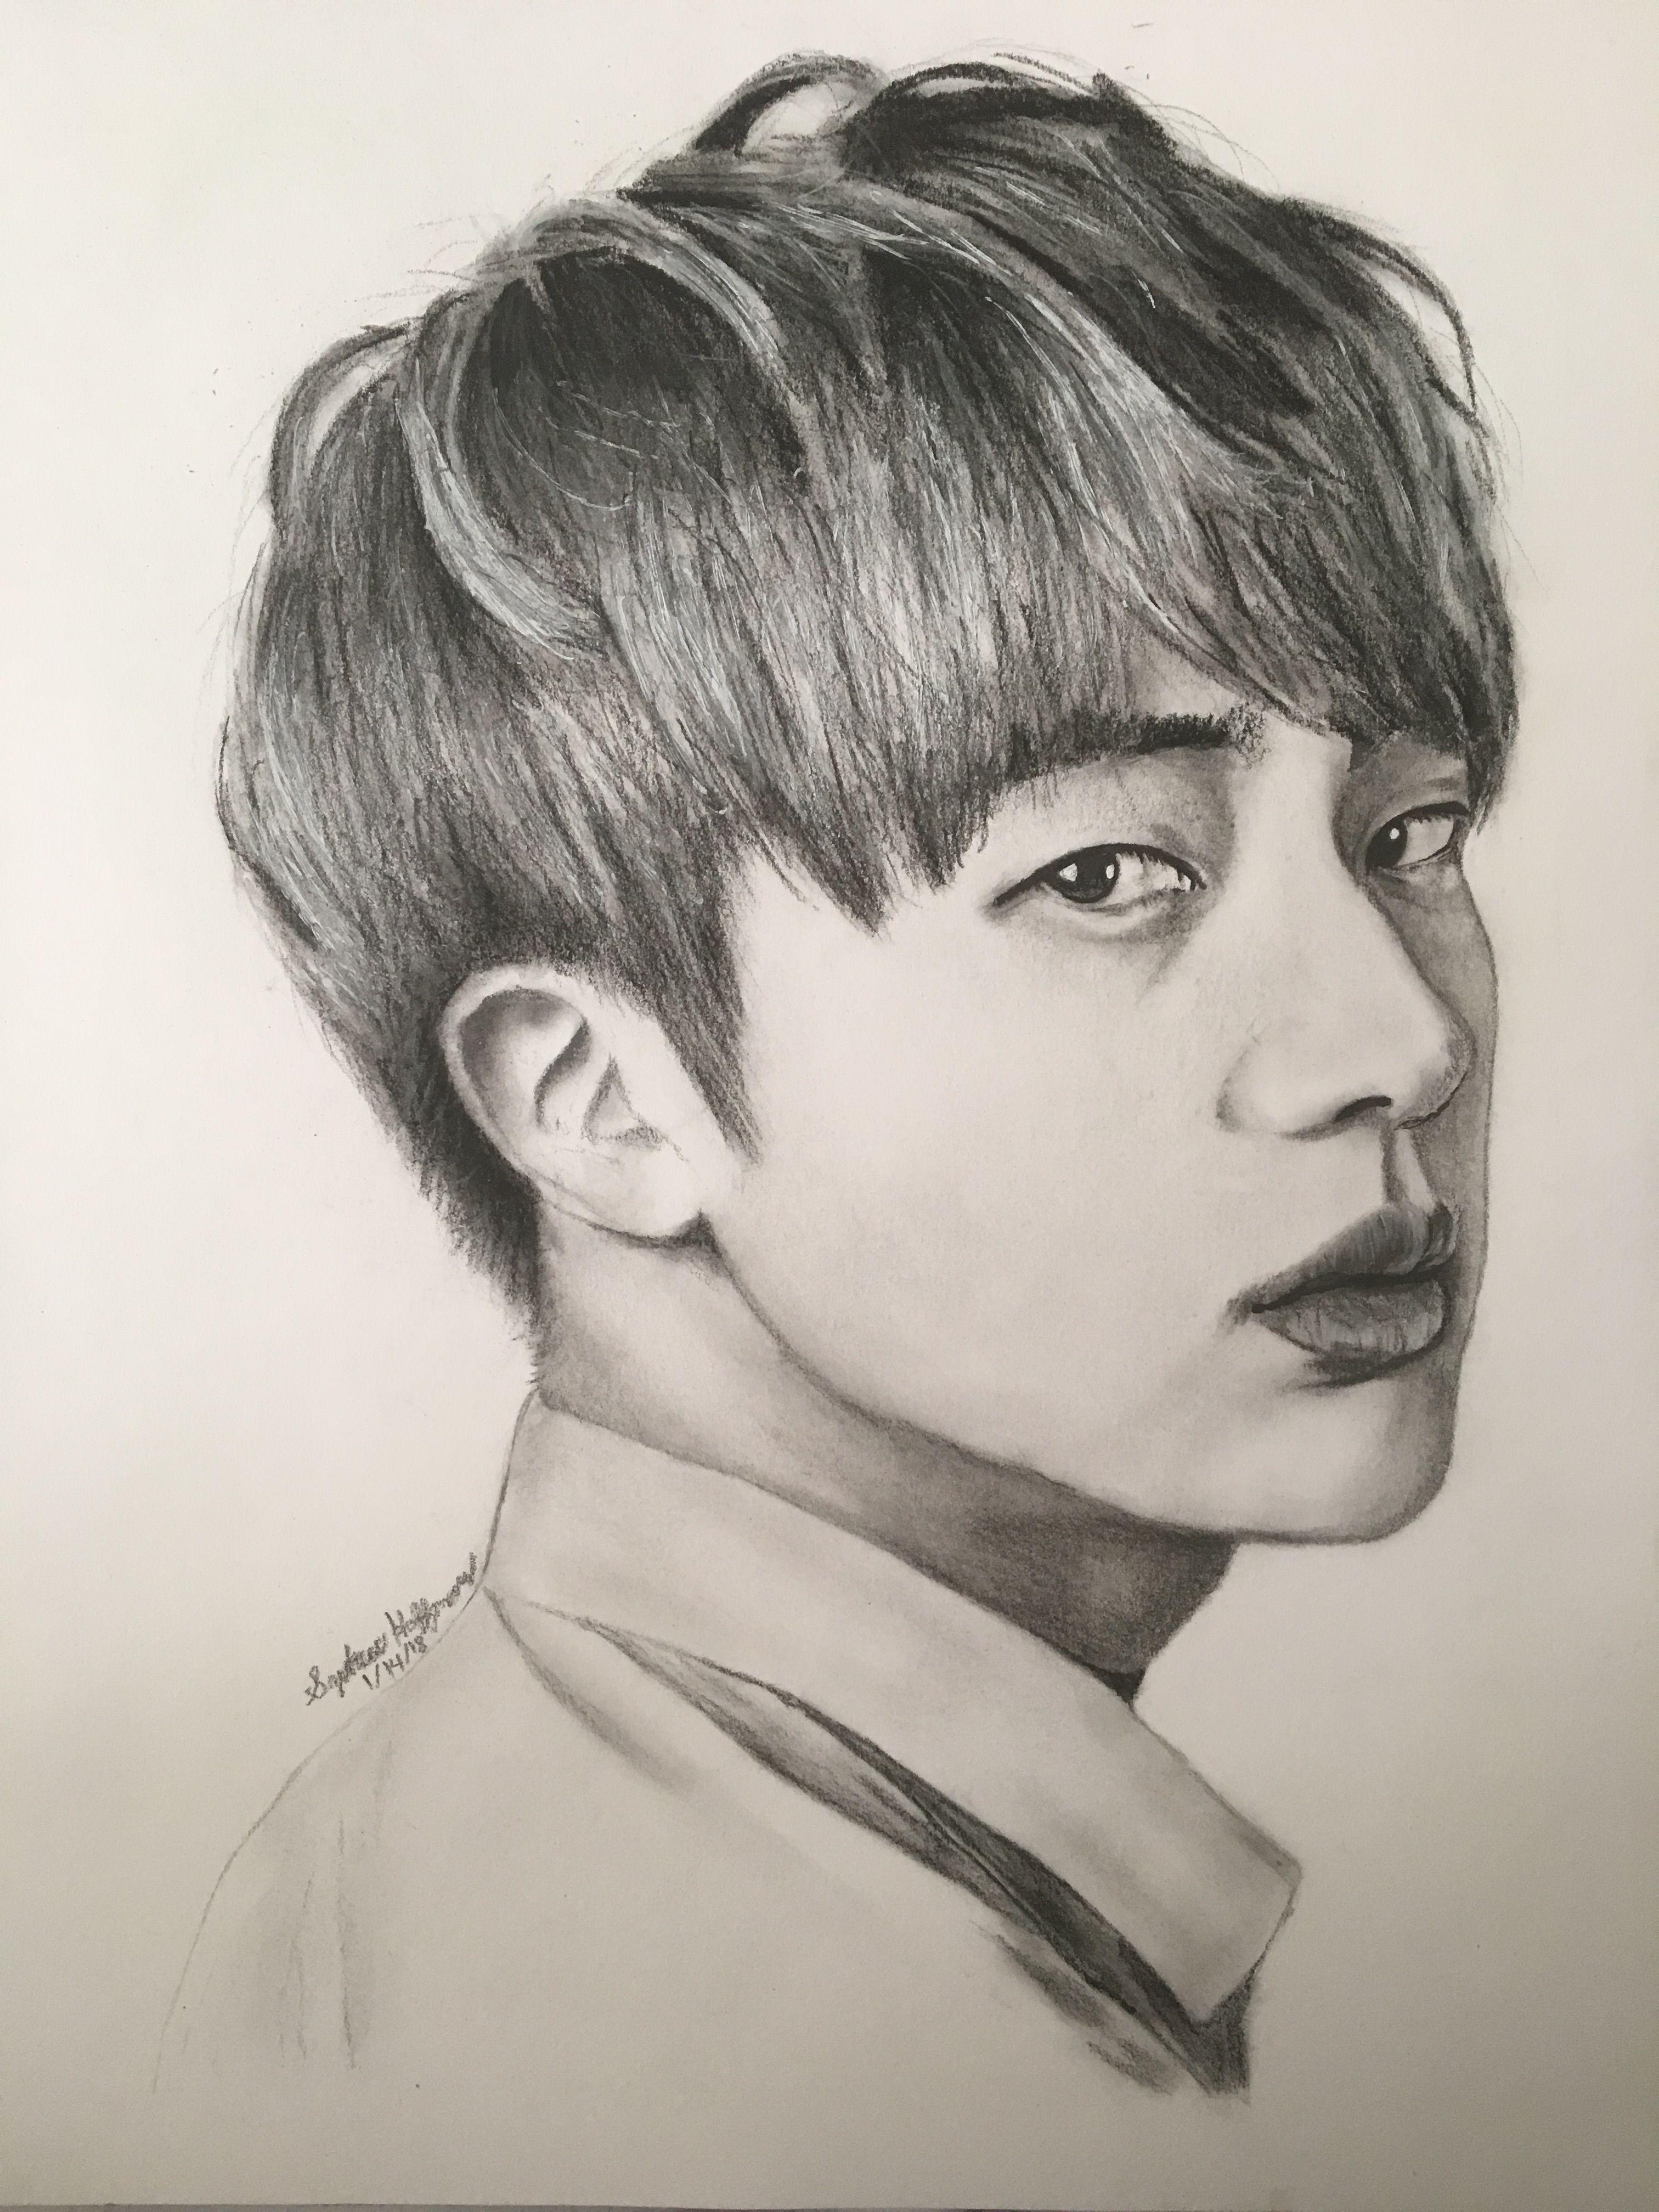 Bts Jin In Charcoal Pencil Dibujos A Lapiz Bts Dibujo Rostros